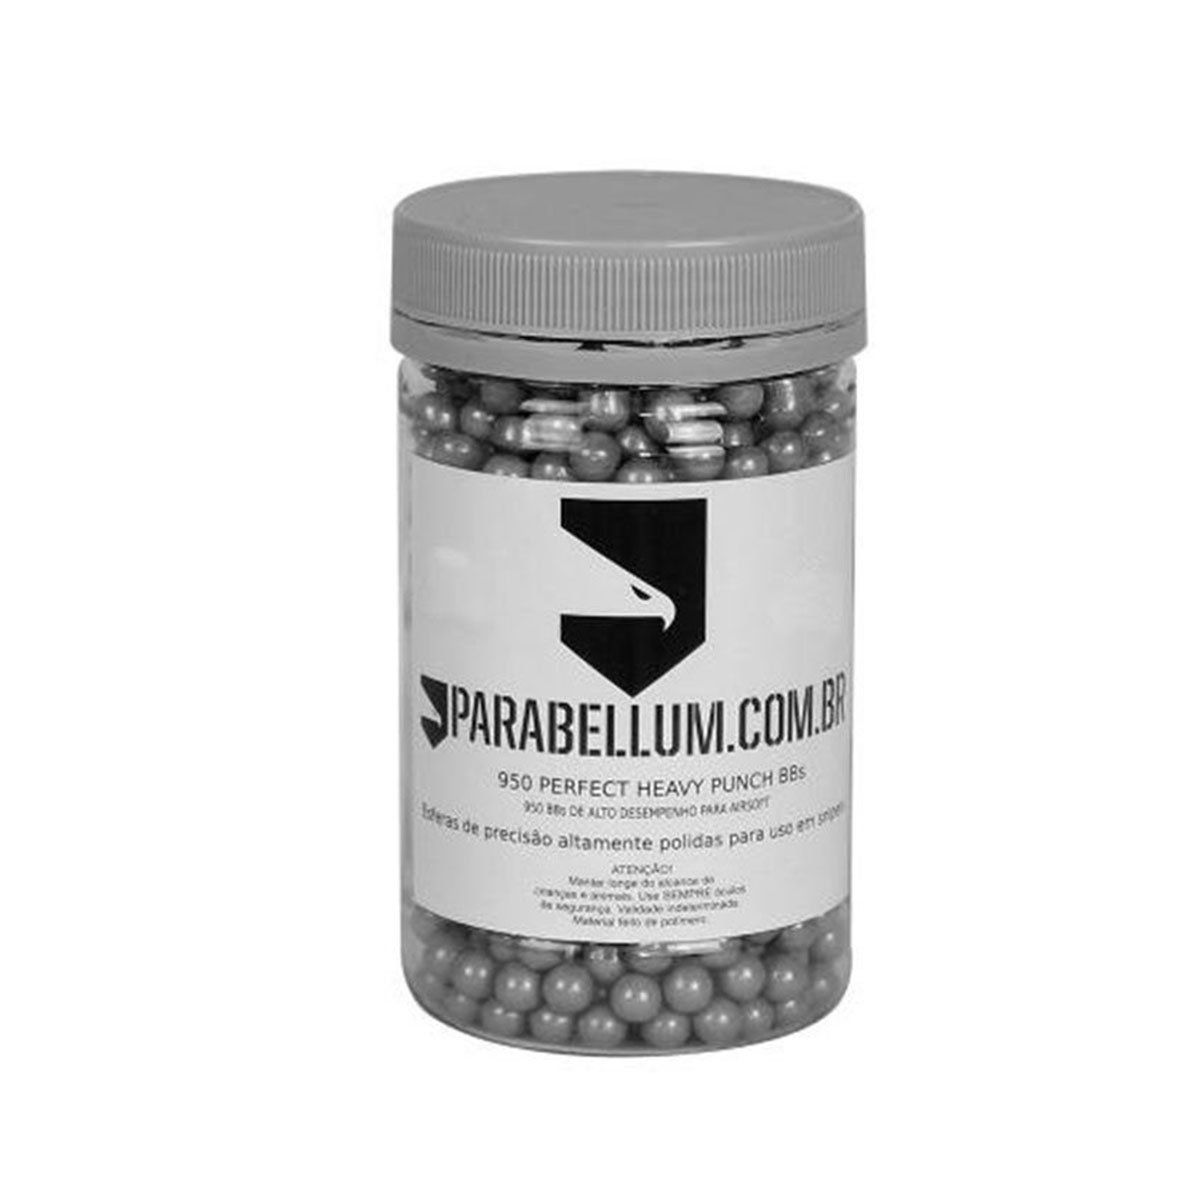 Esferas Plásticas BBs Parabellum Calibre 6mm 0,46g 950un